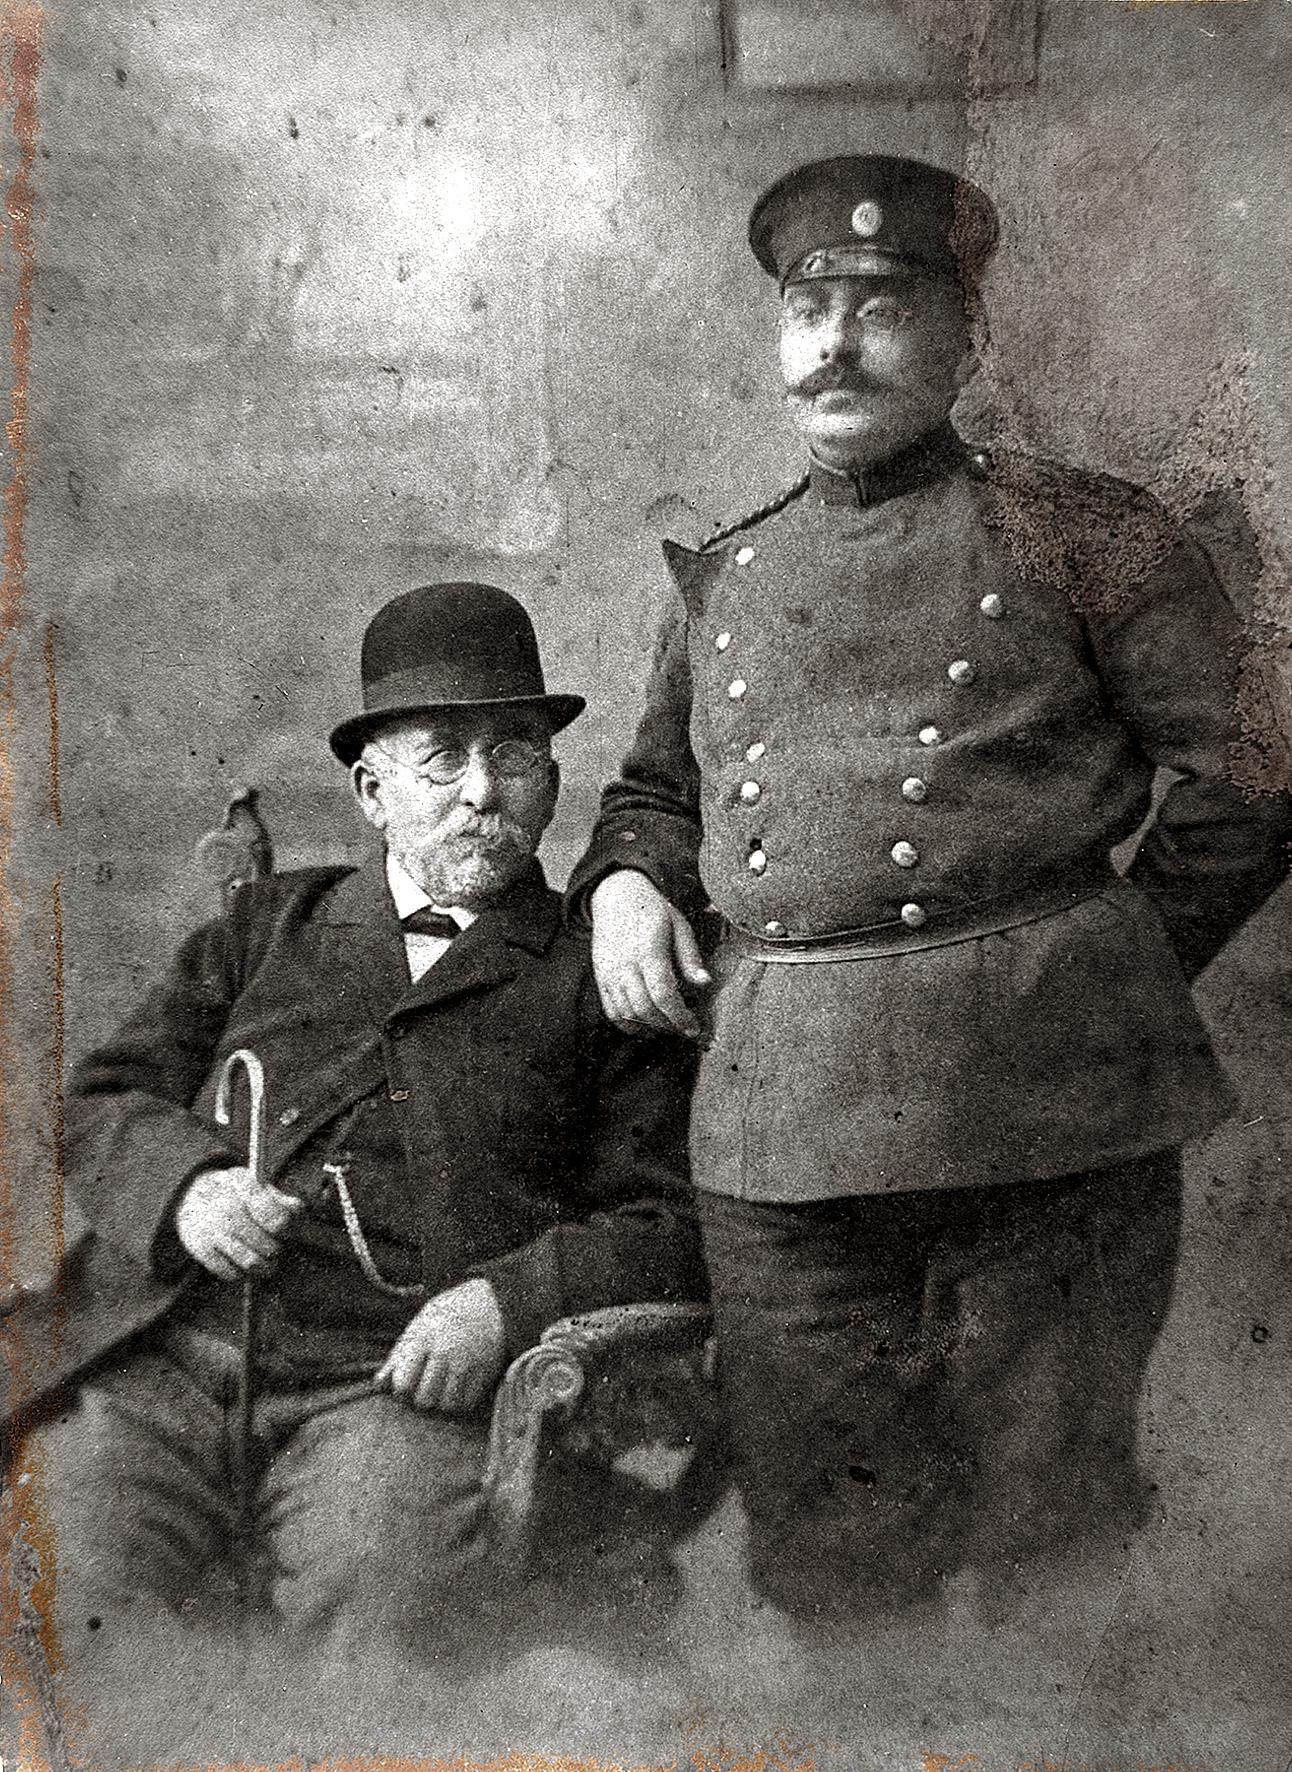 Matilda Albuhaire's paternal grandfather, Yacov Mercado Albuhaire, with his son Avram Albuhaire